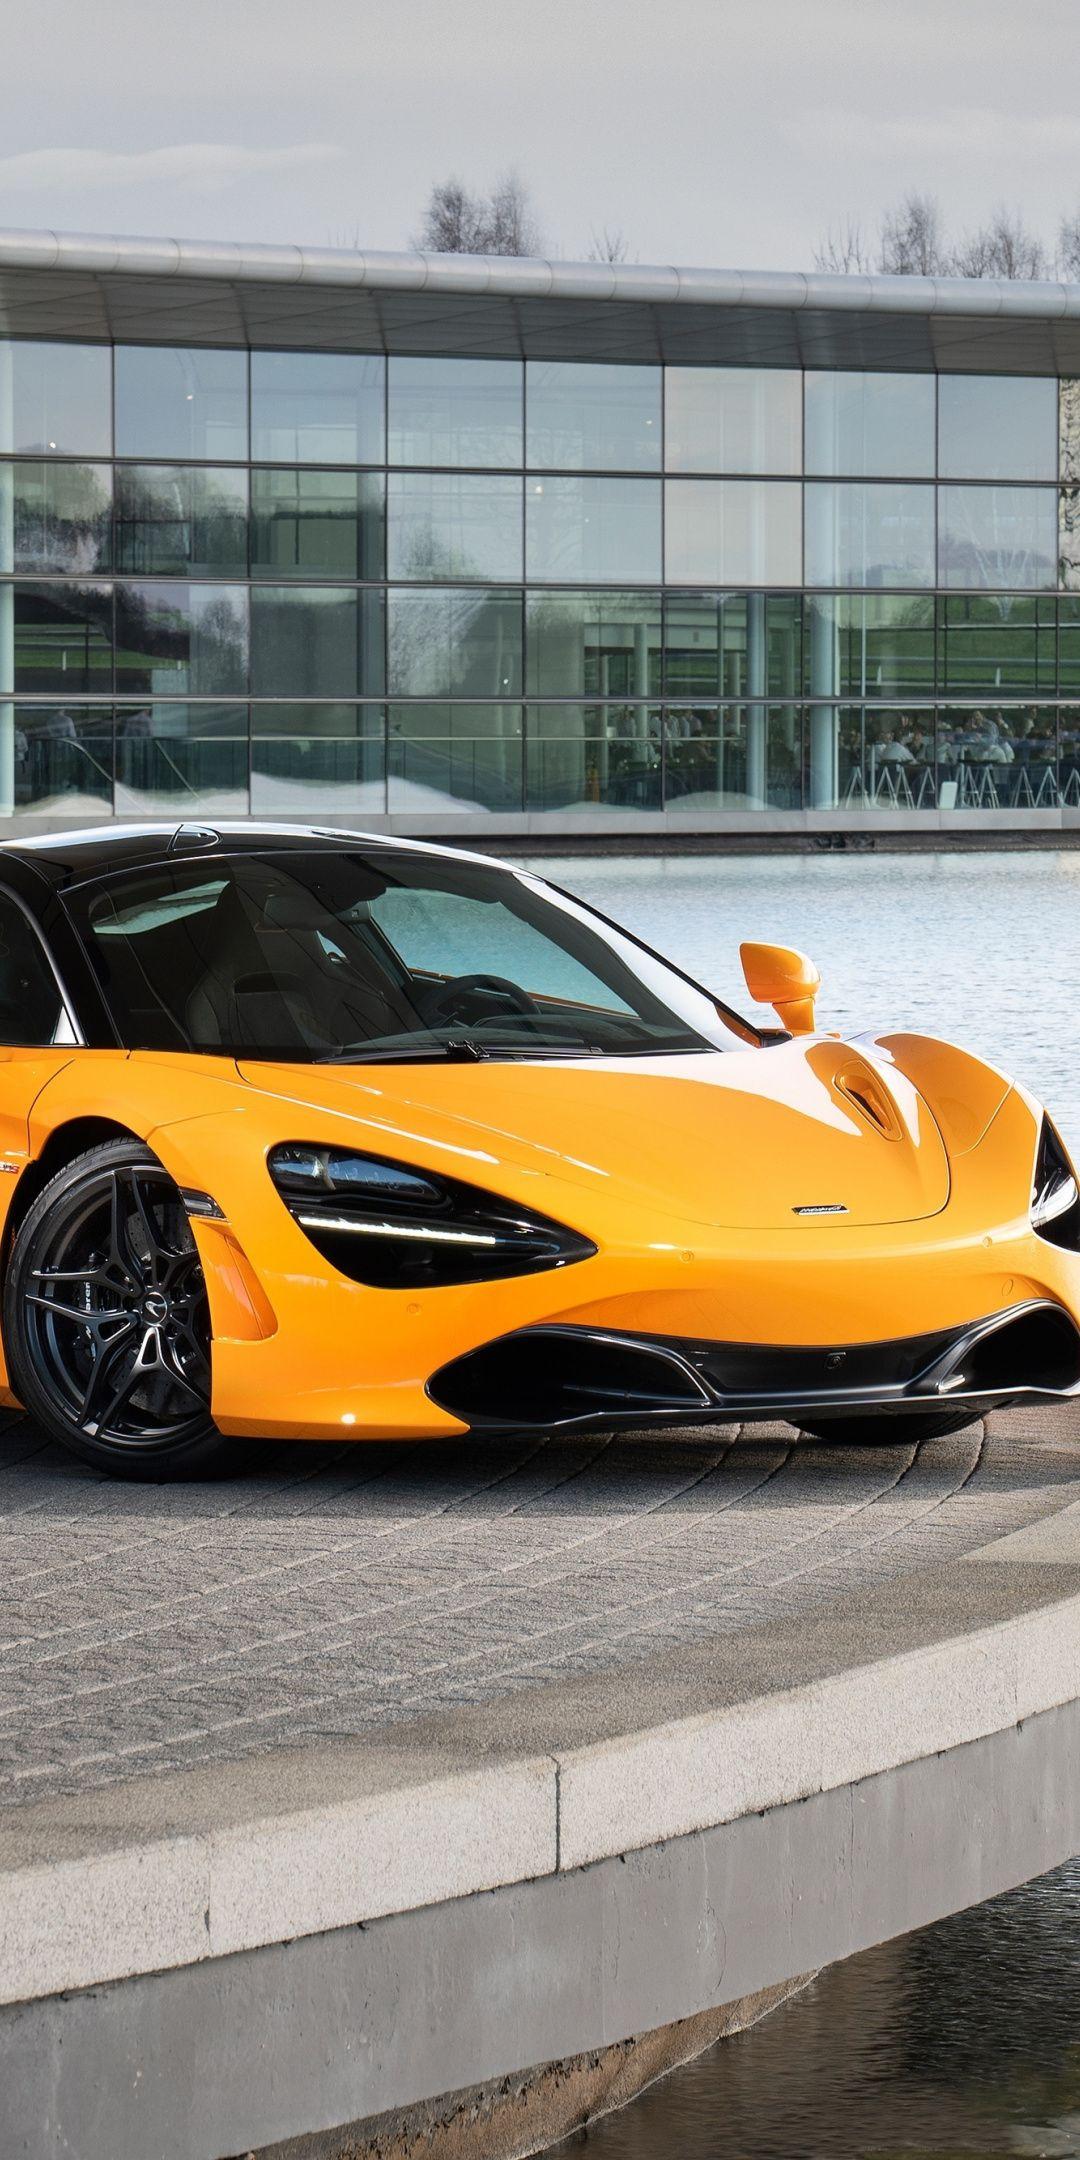 Sports Car Yellow 2018 Mclaren 720s 1080x2160 Wallpaper Car Maclaren Cars Sports Car